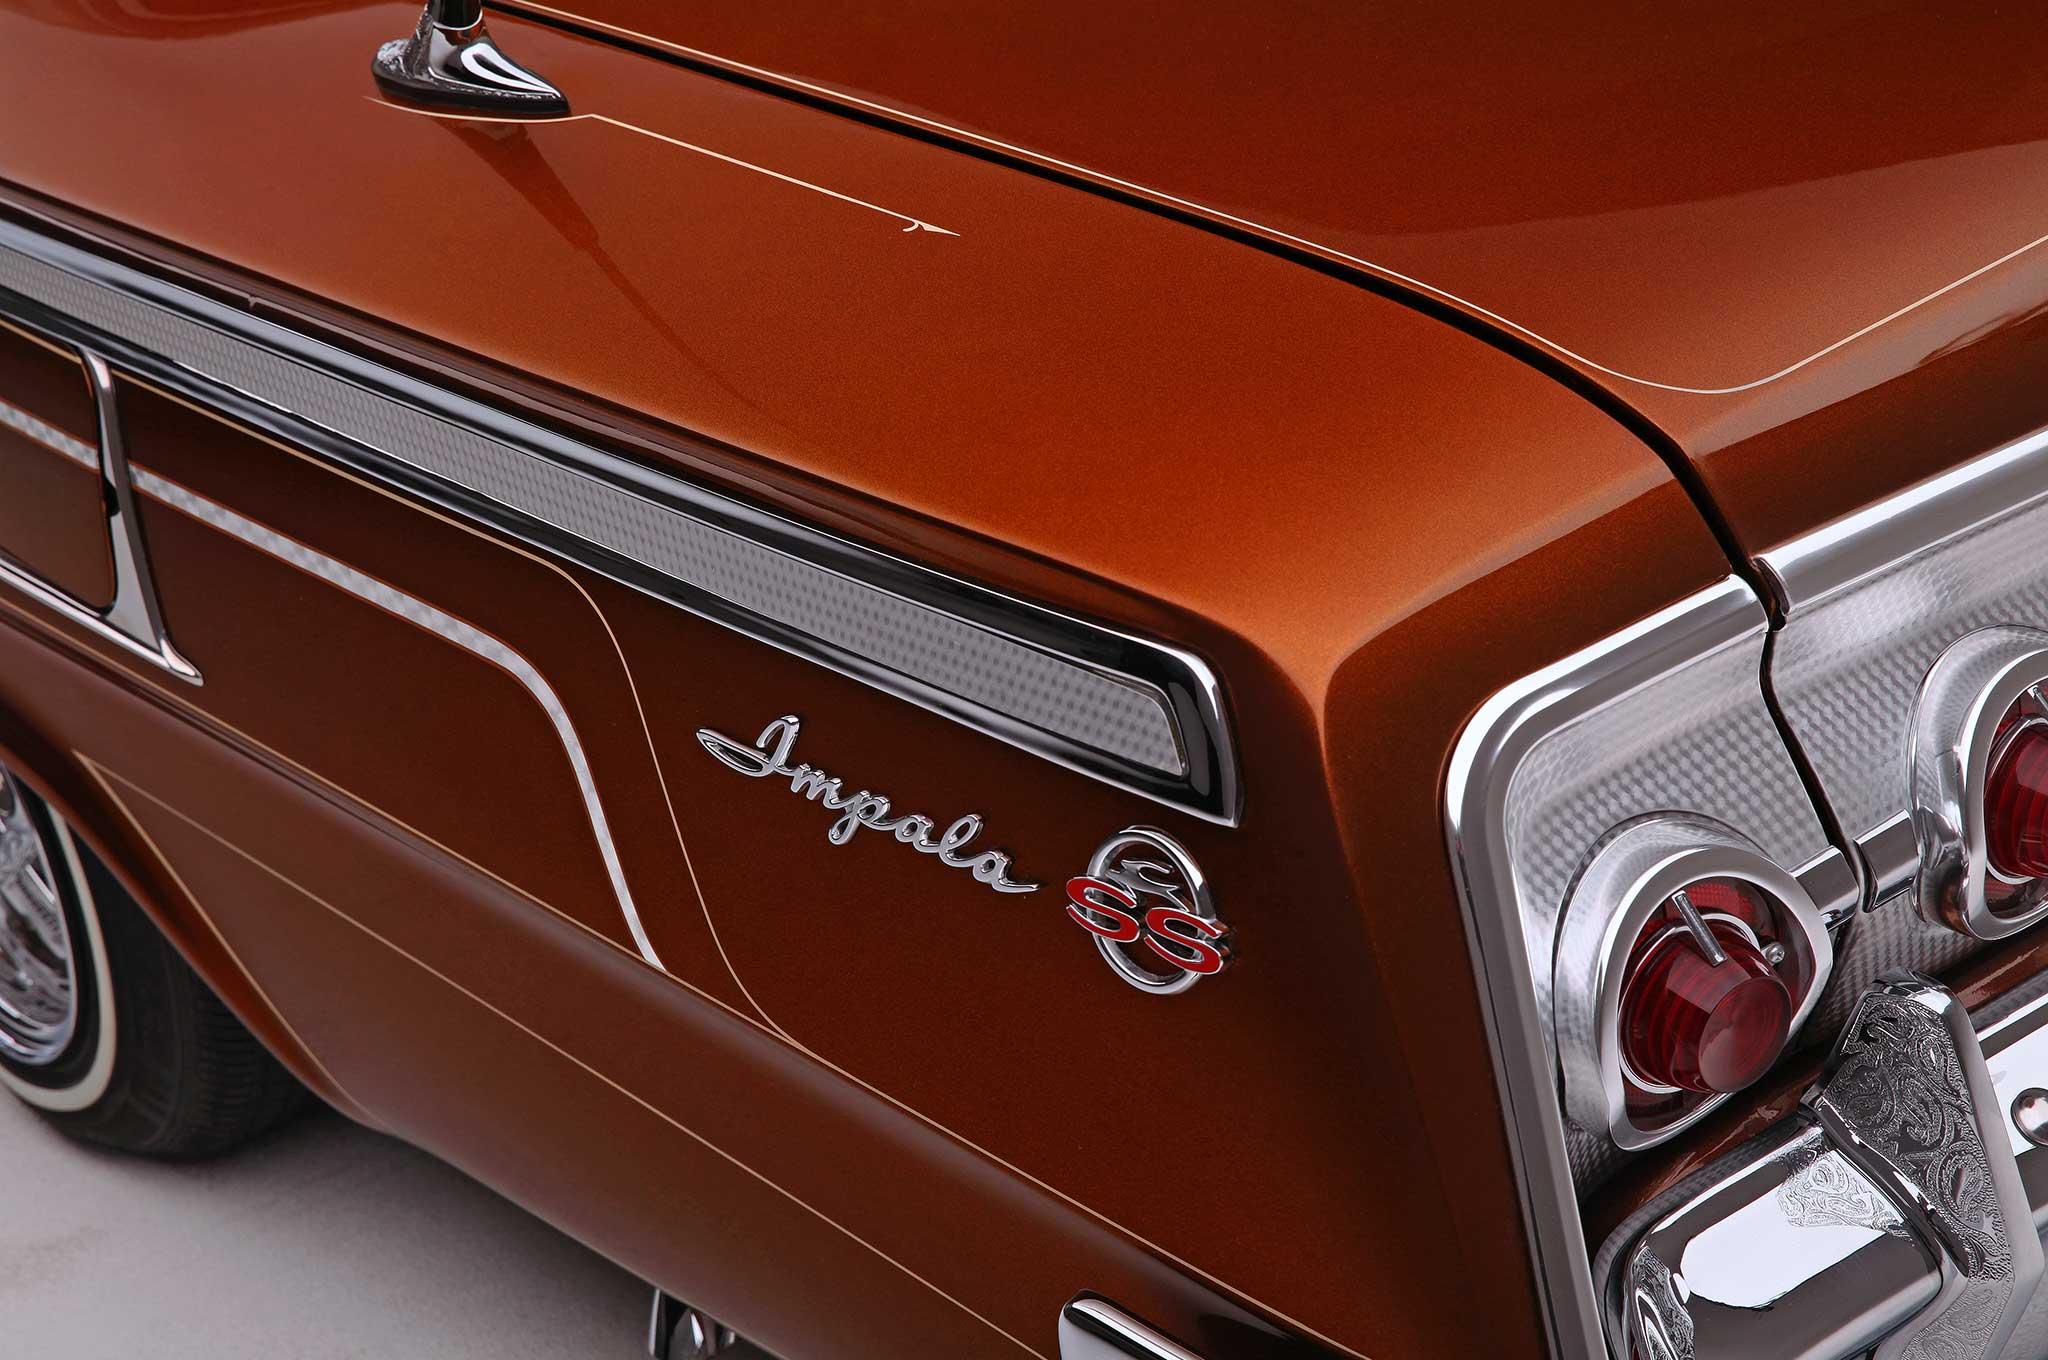 62 Impala SS Quarter Panel Emblems  NEW